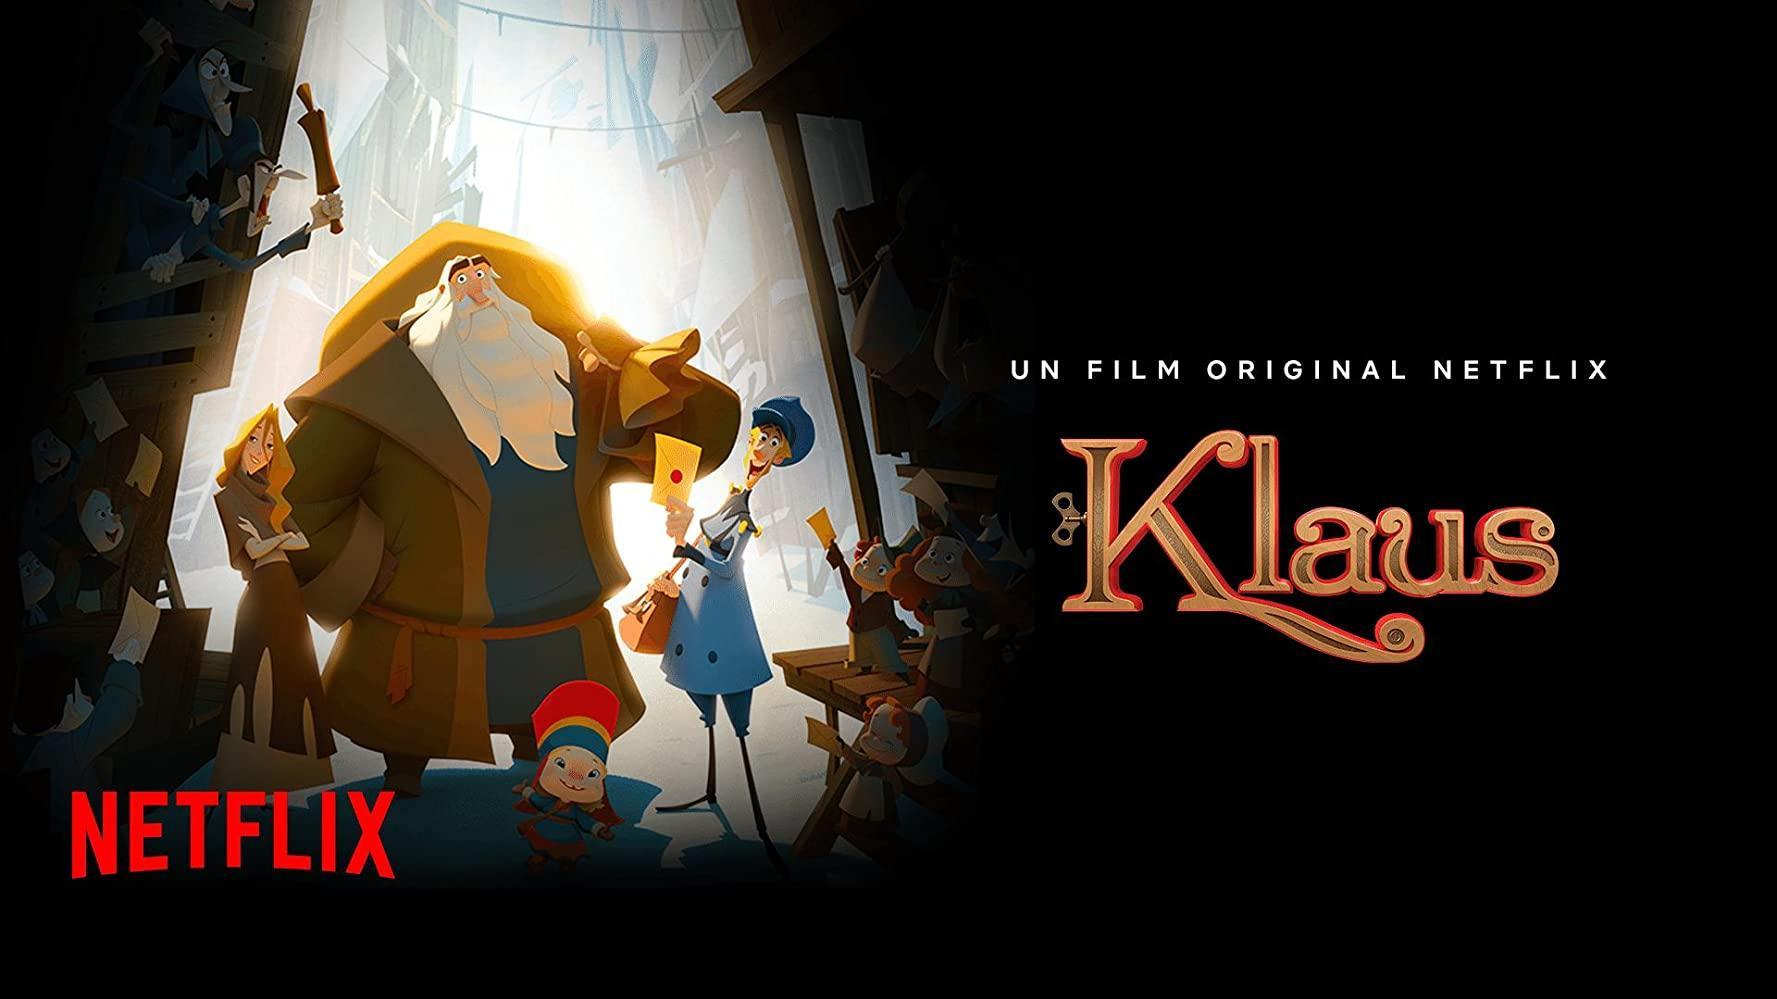 مشاهدة فيلم Klaus (2019) مترجم HD اون لاين